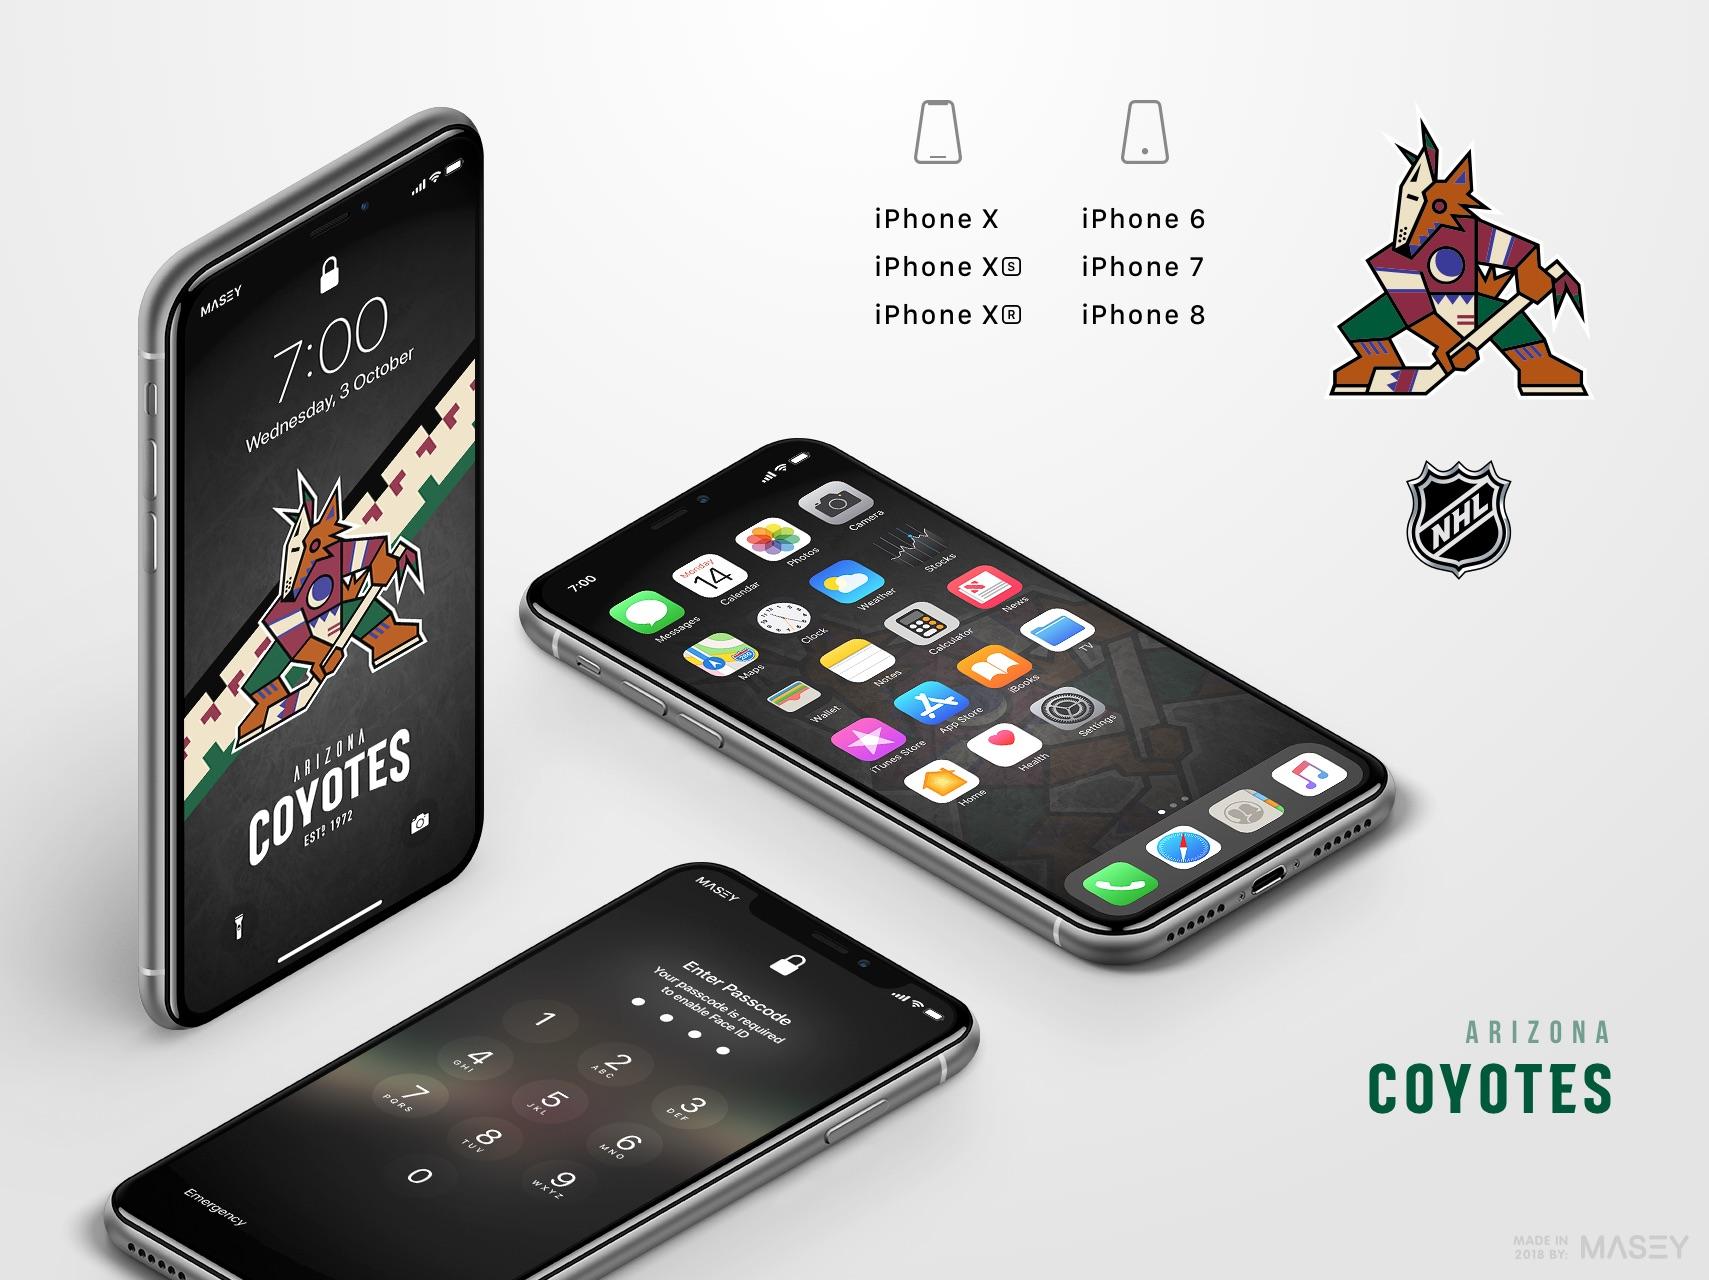 Arizona Coyotes iPhone Wallpaper